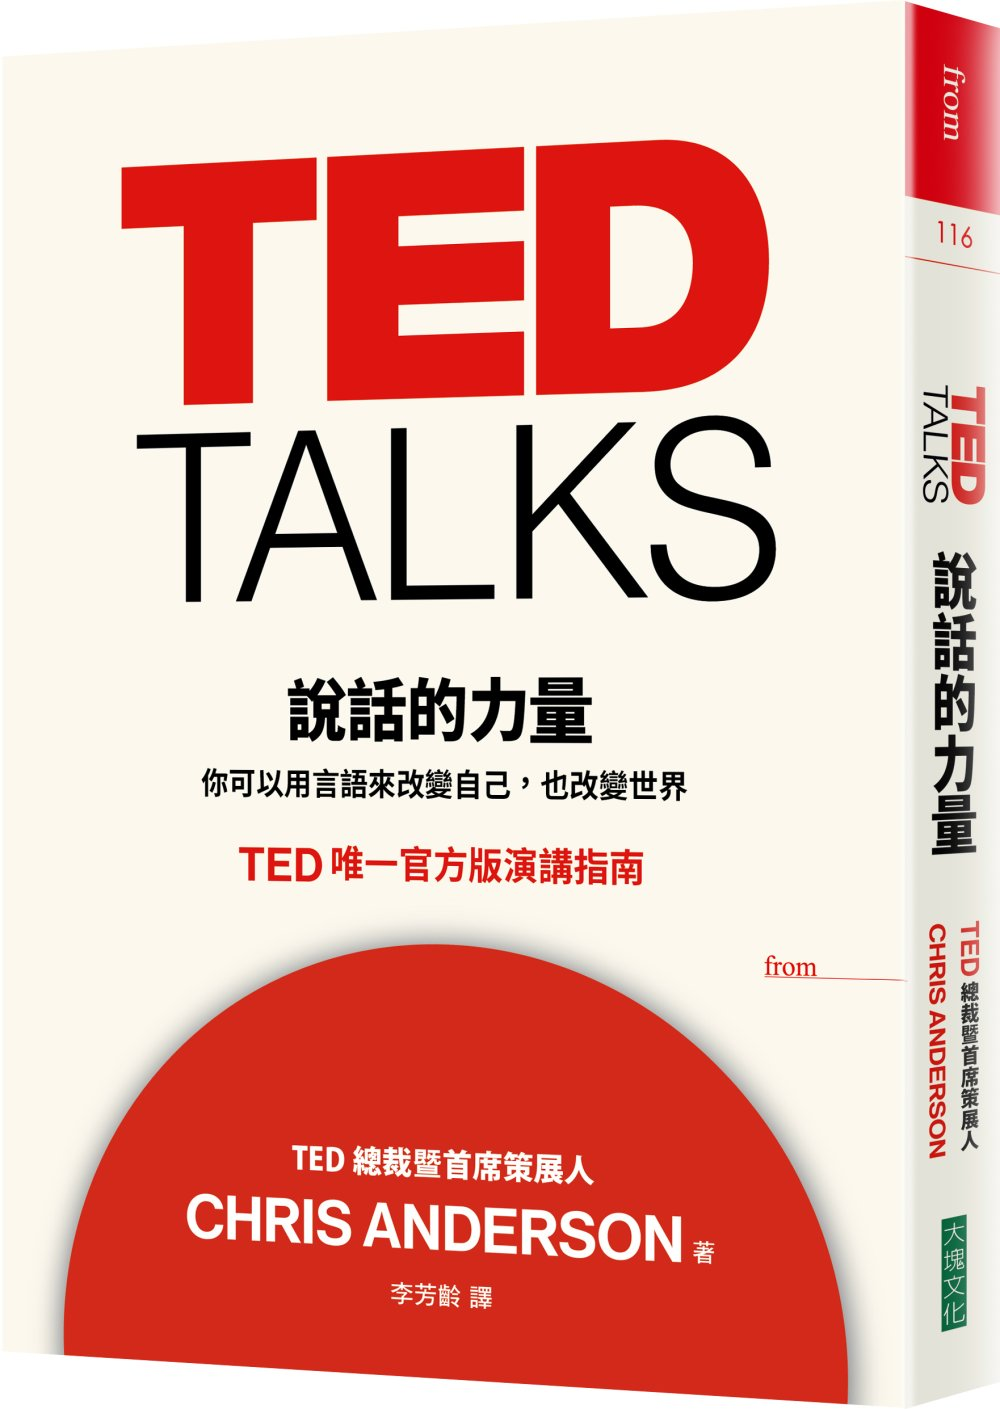 TED TALKS 說話的力量:你可以用言語來改變自己,也改變世界 TED唯一官方版演講指南